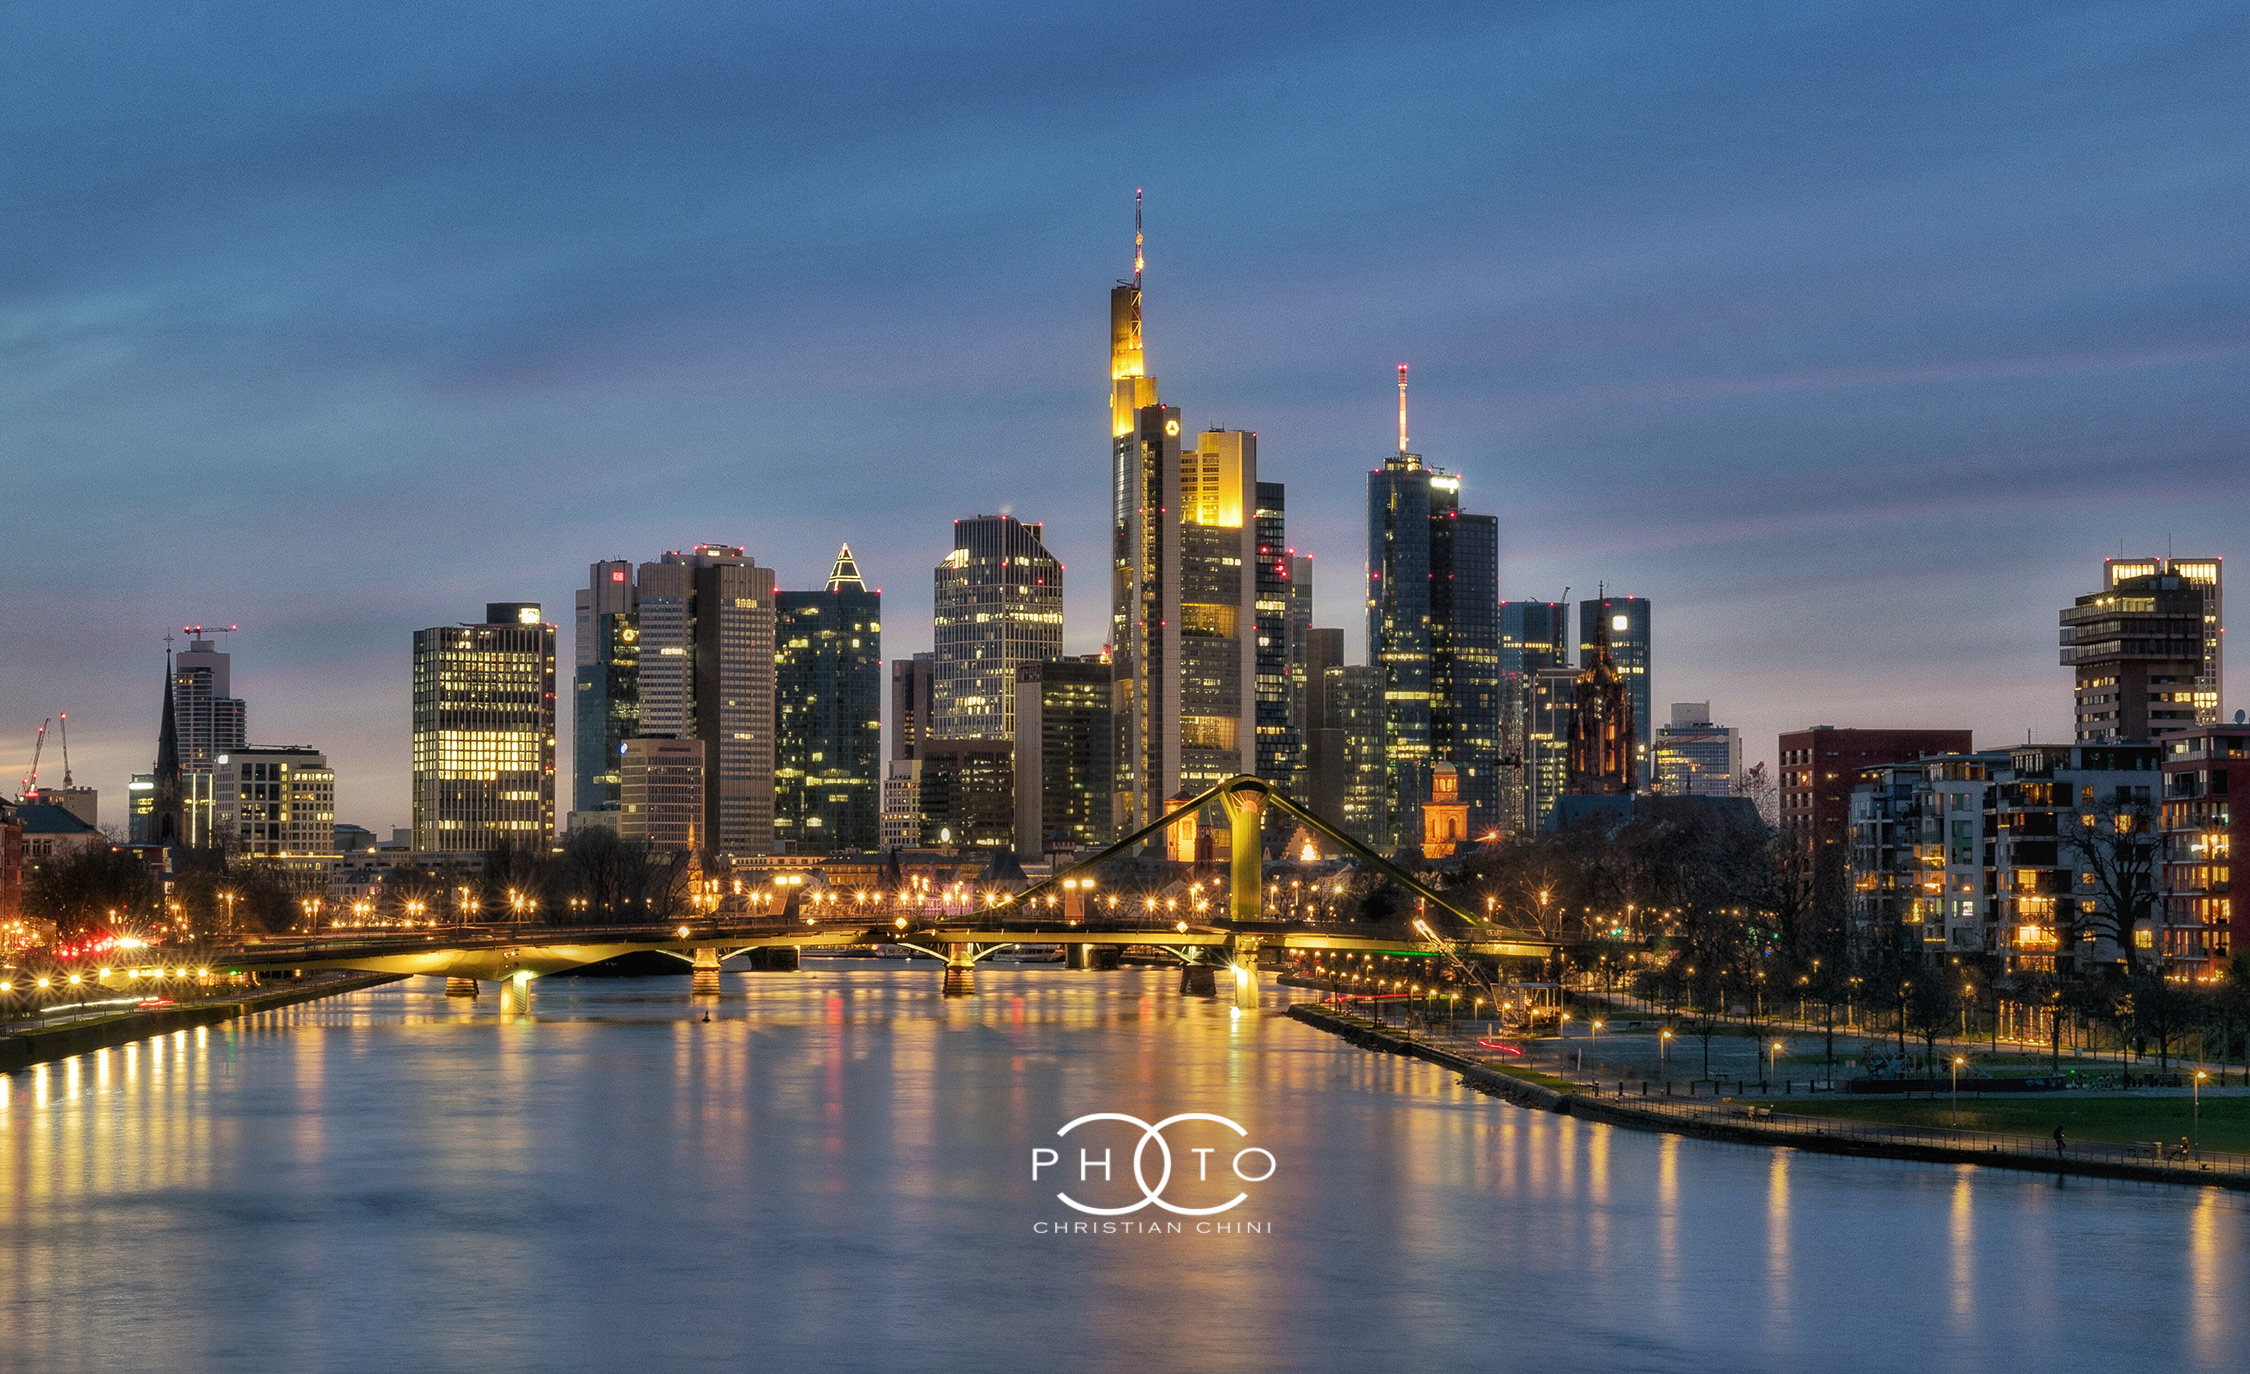 Frankfurt meets the blue hour...